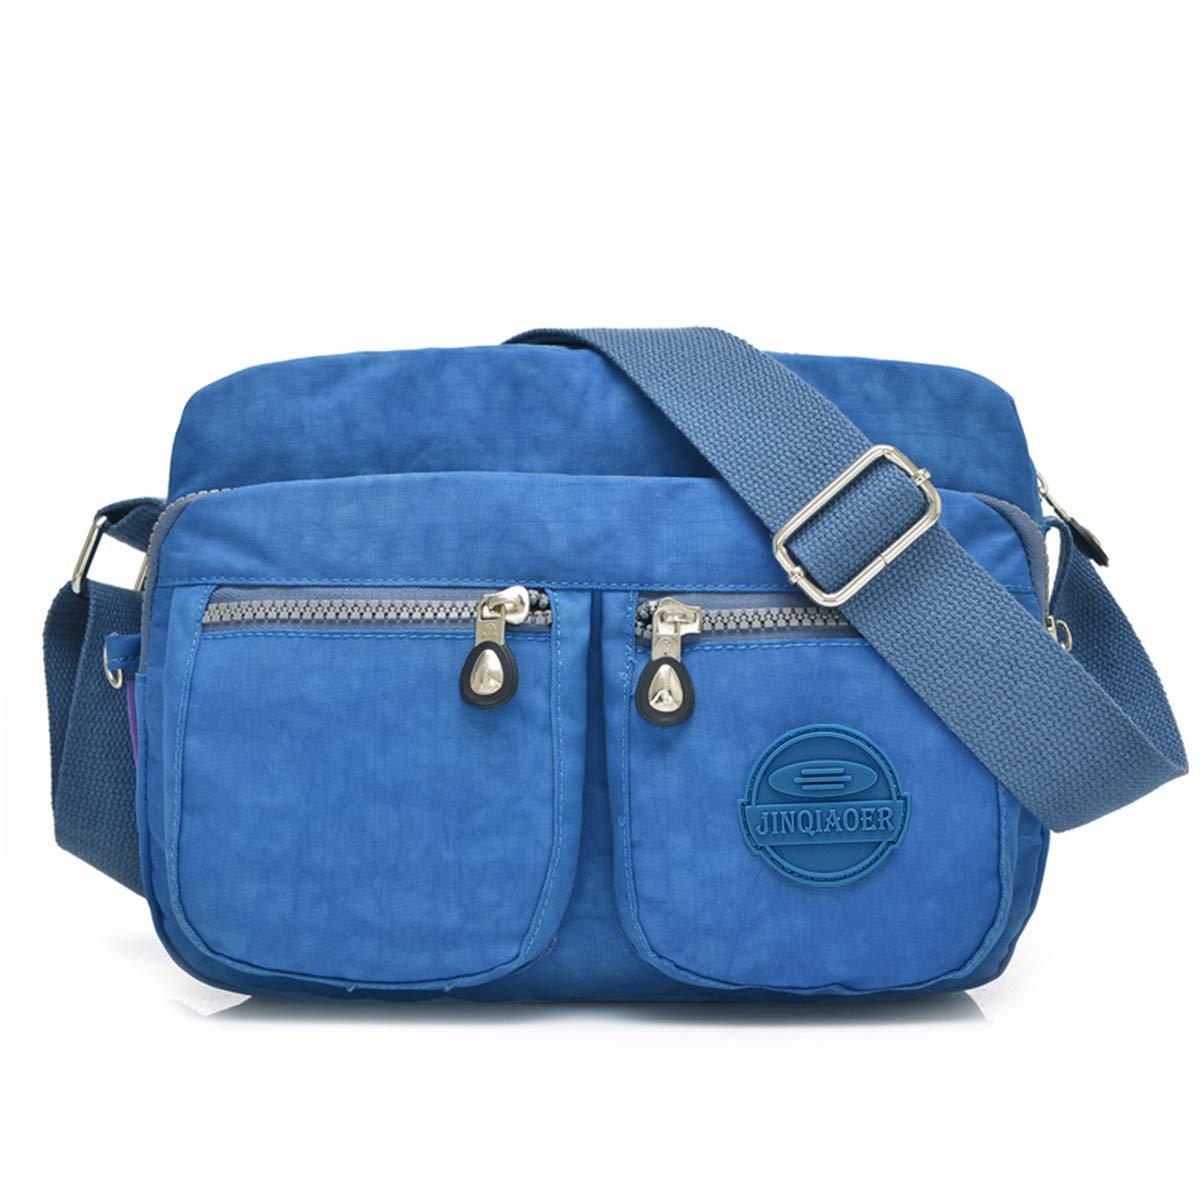 Tiny Chou Lightweight Waterproof Nylon Shoulder Bag Compact Crossbody Messenger  Bag with Pockets (3116 Blue)  Handbags  Amazon.com 38f3bd4068c35